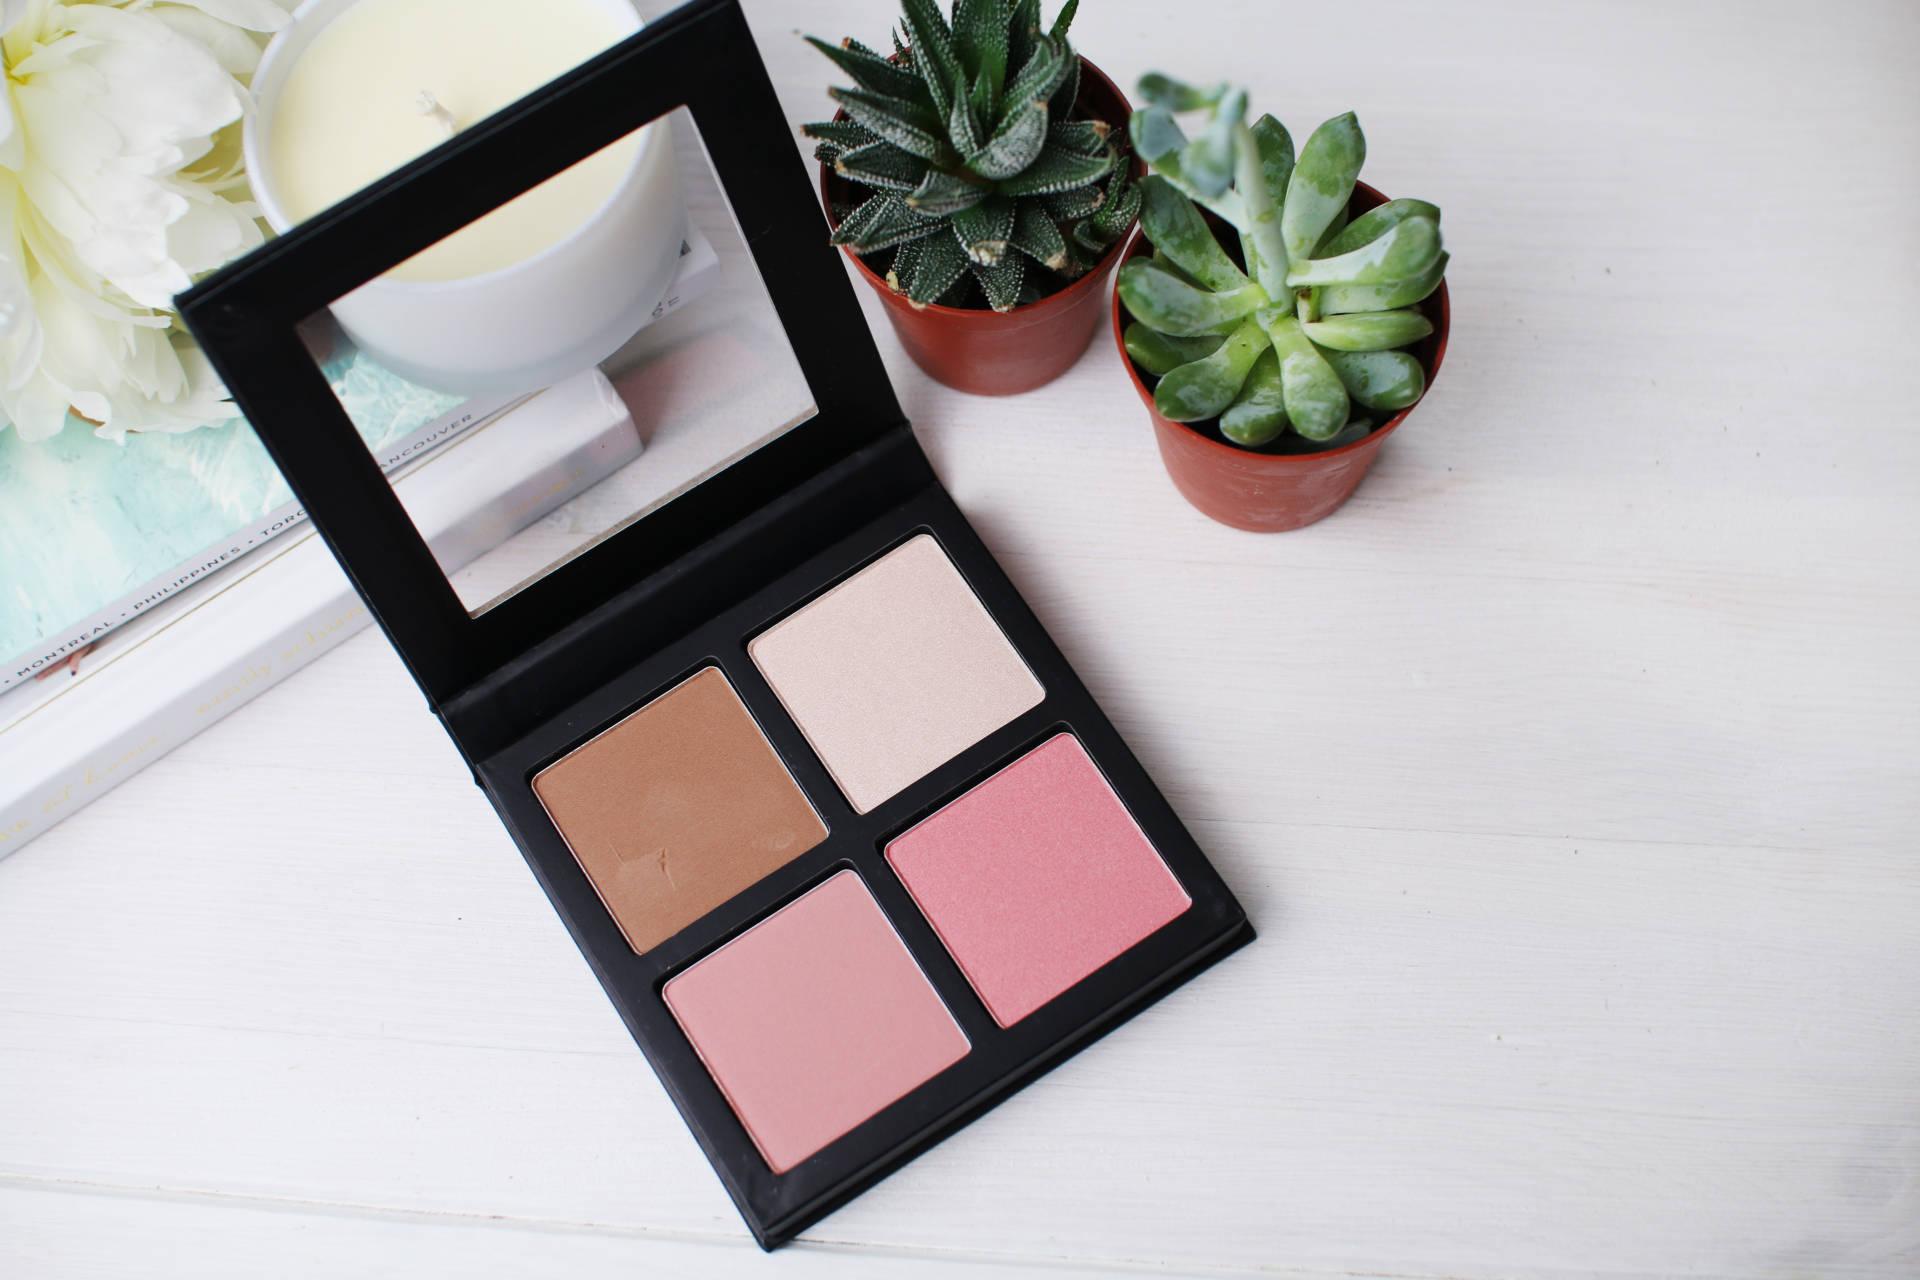 Collection pro palettes blush